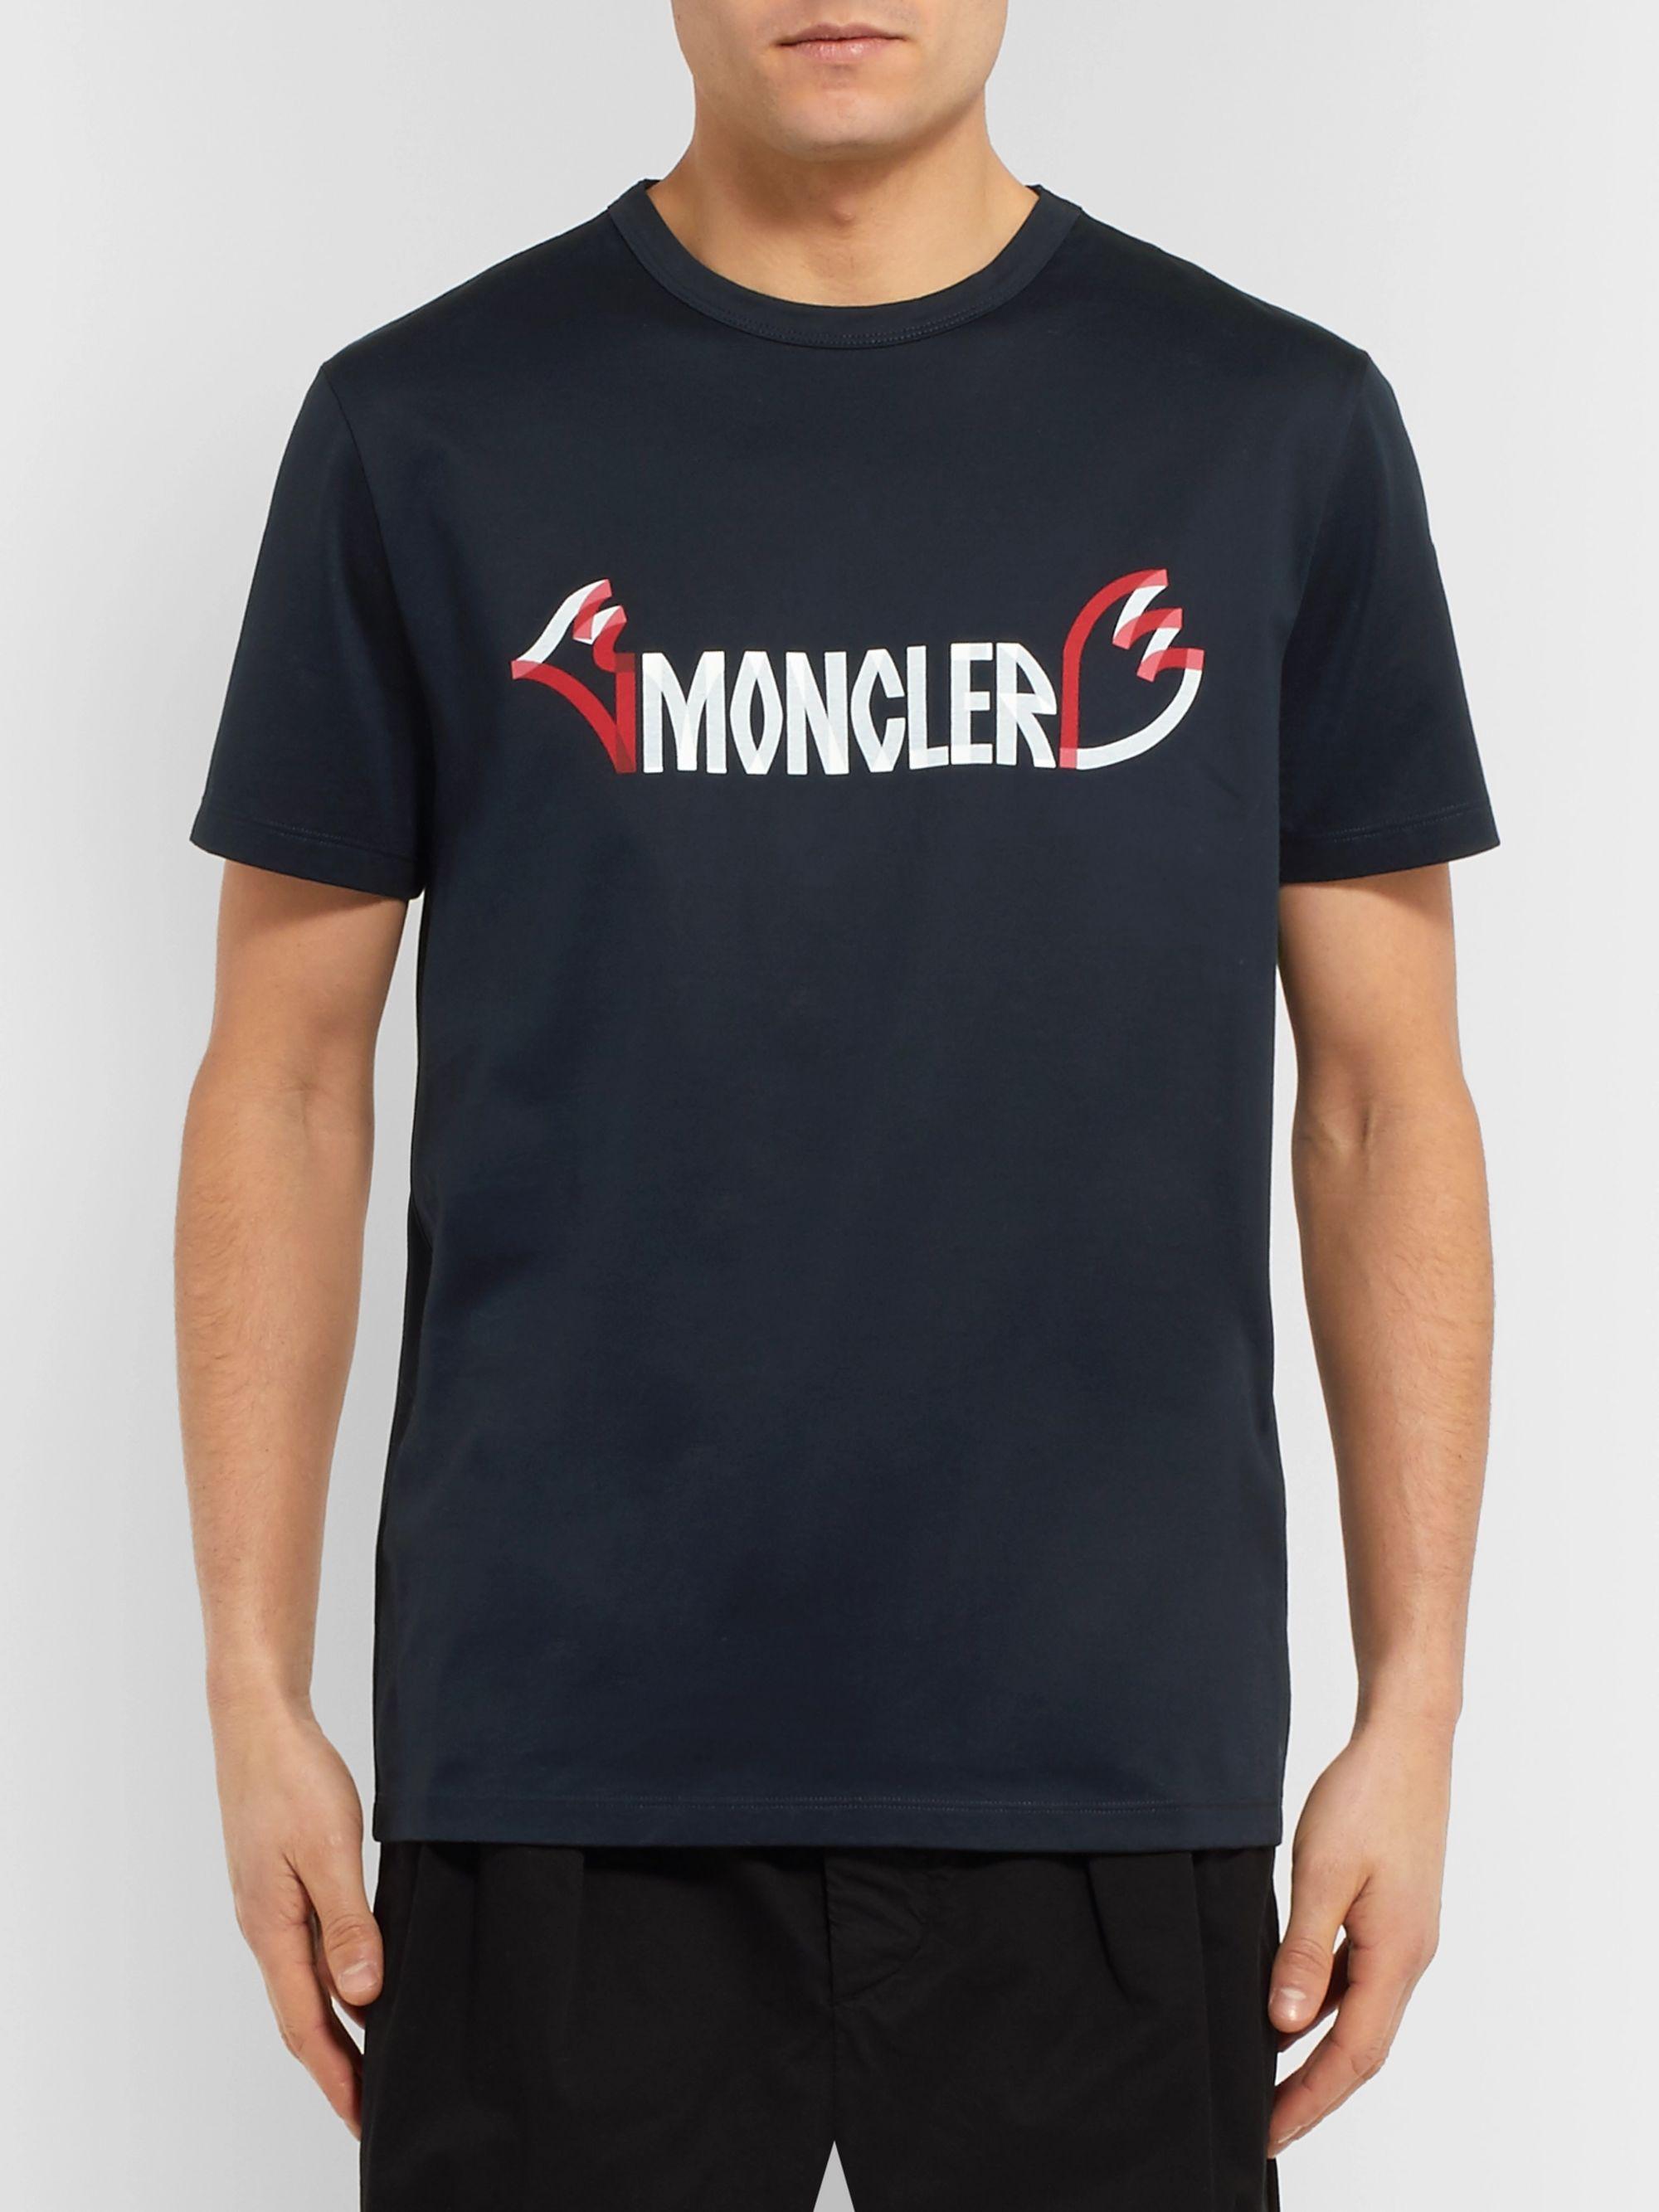 3e6436112 2 Moncler 1952 Printed Cotton-Jersey T-Shirt